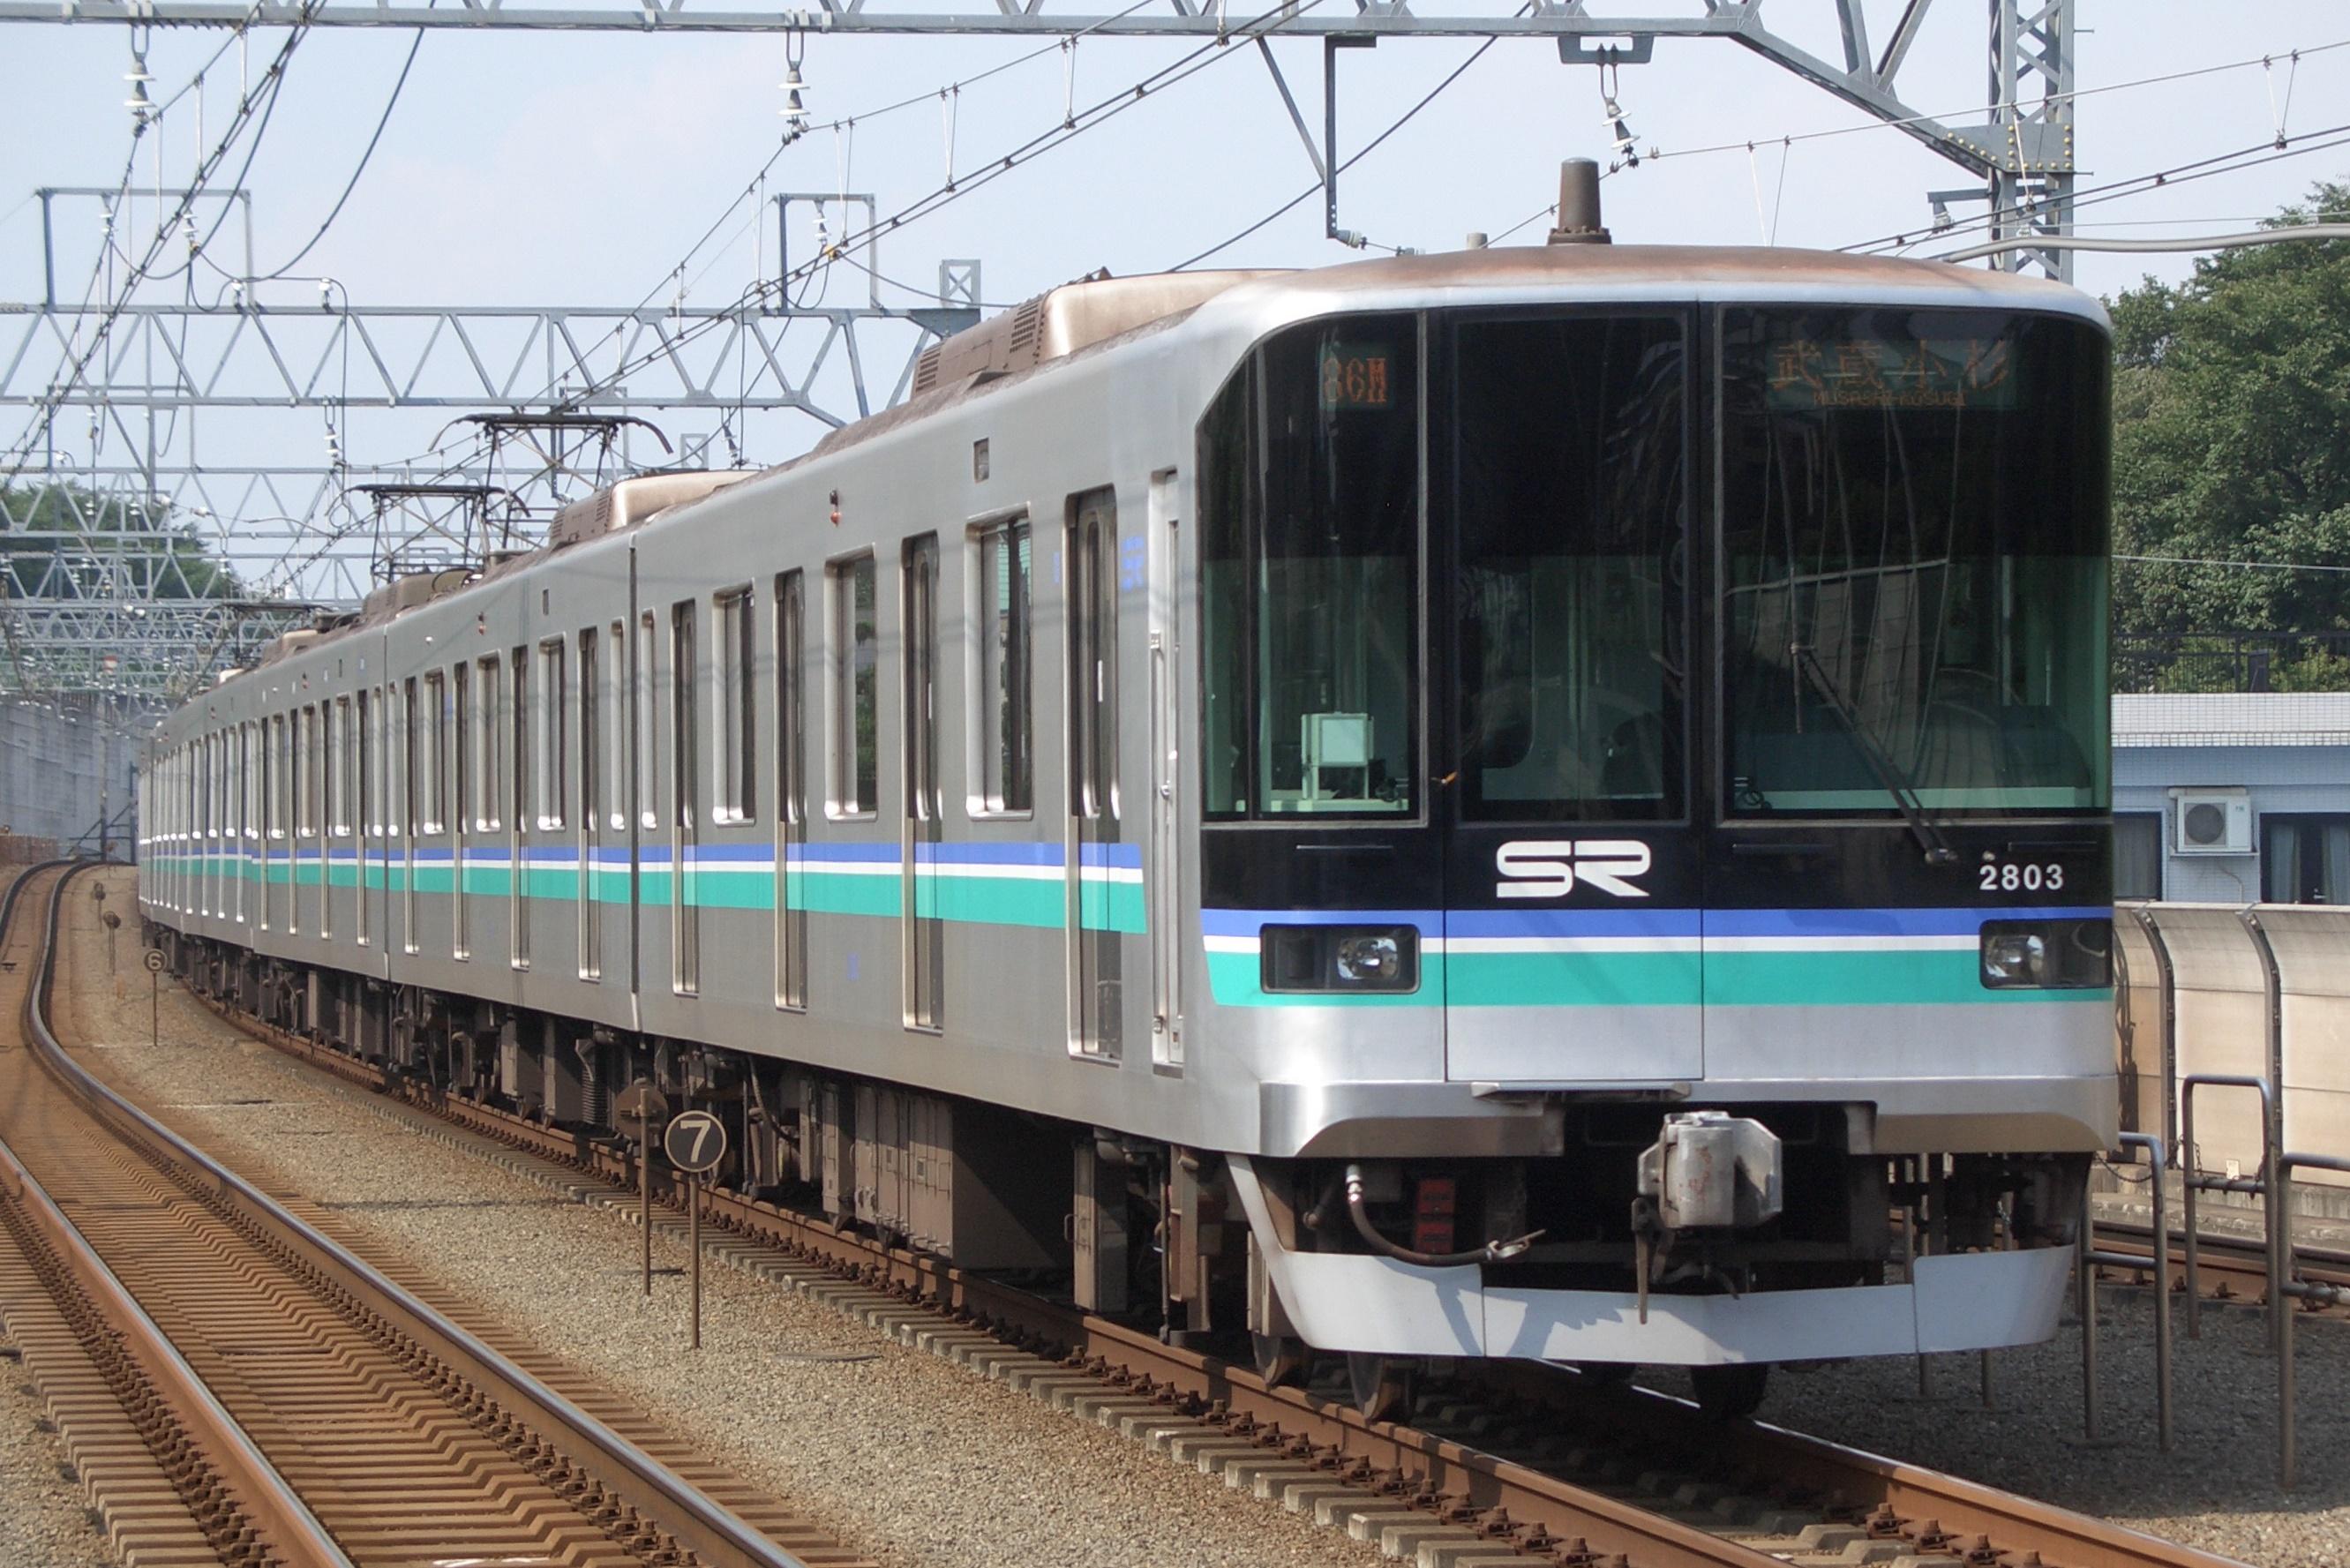 https://upload.wikimedia.org/wikipedia/commons/d/d0/Saitama-Railway-2000.jpg